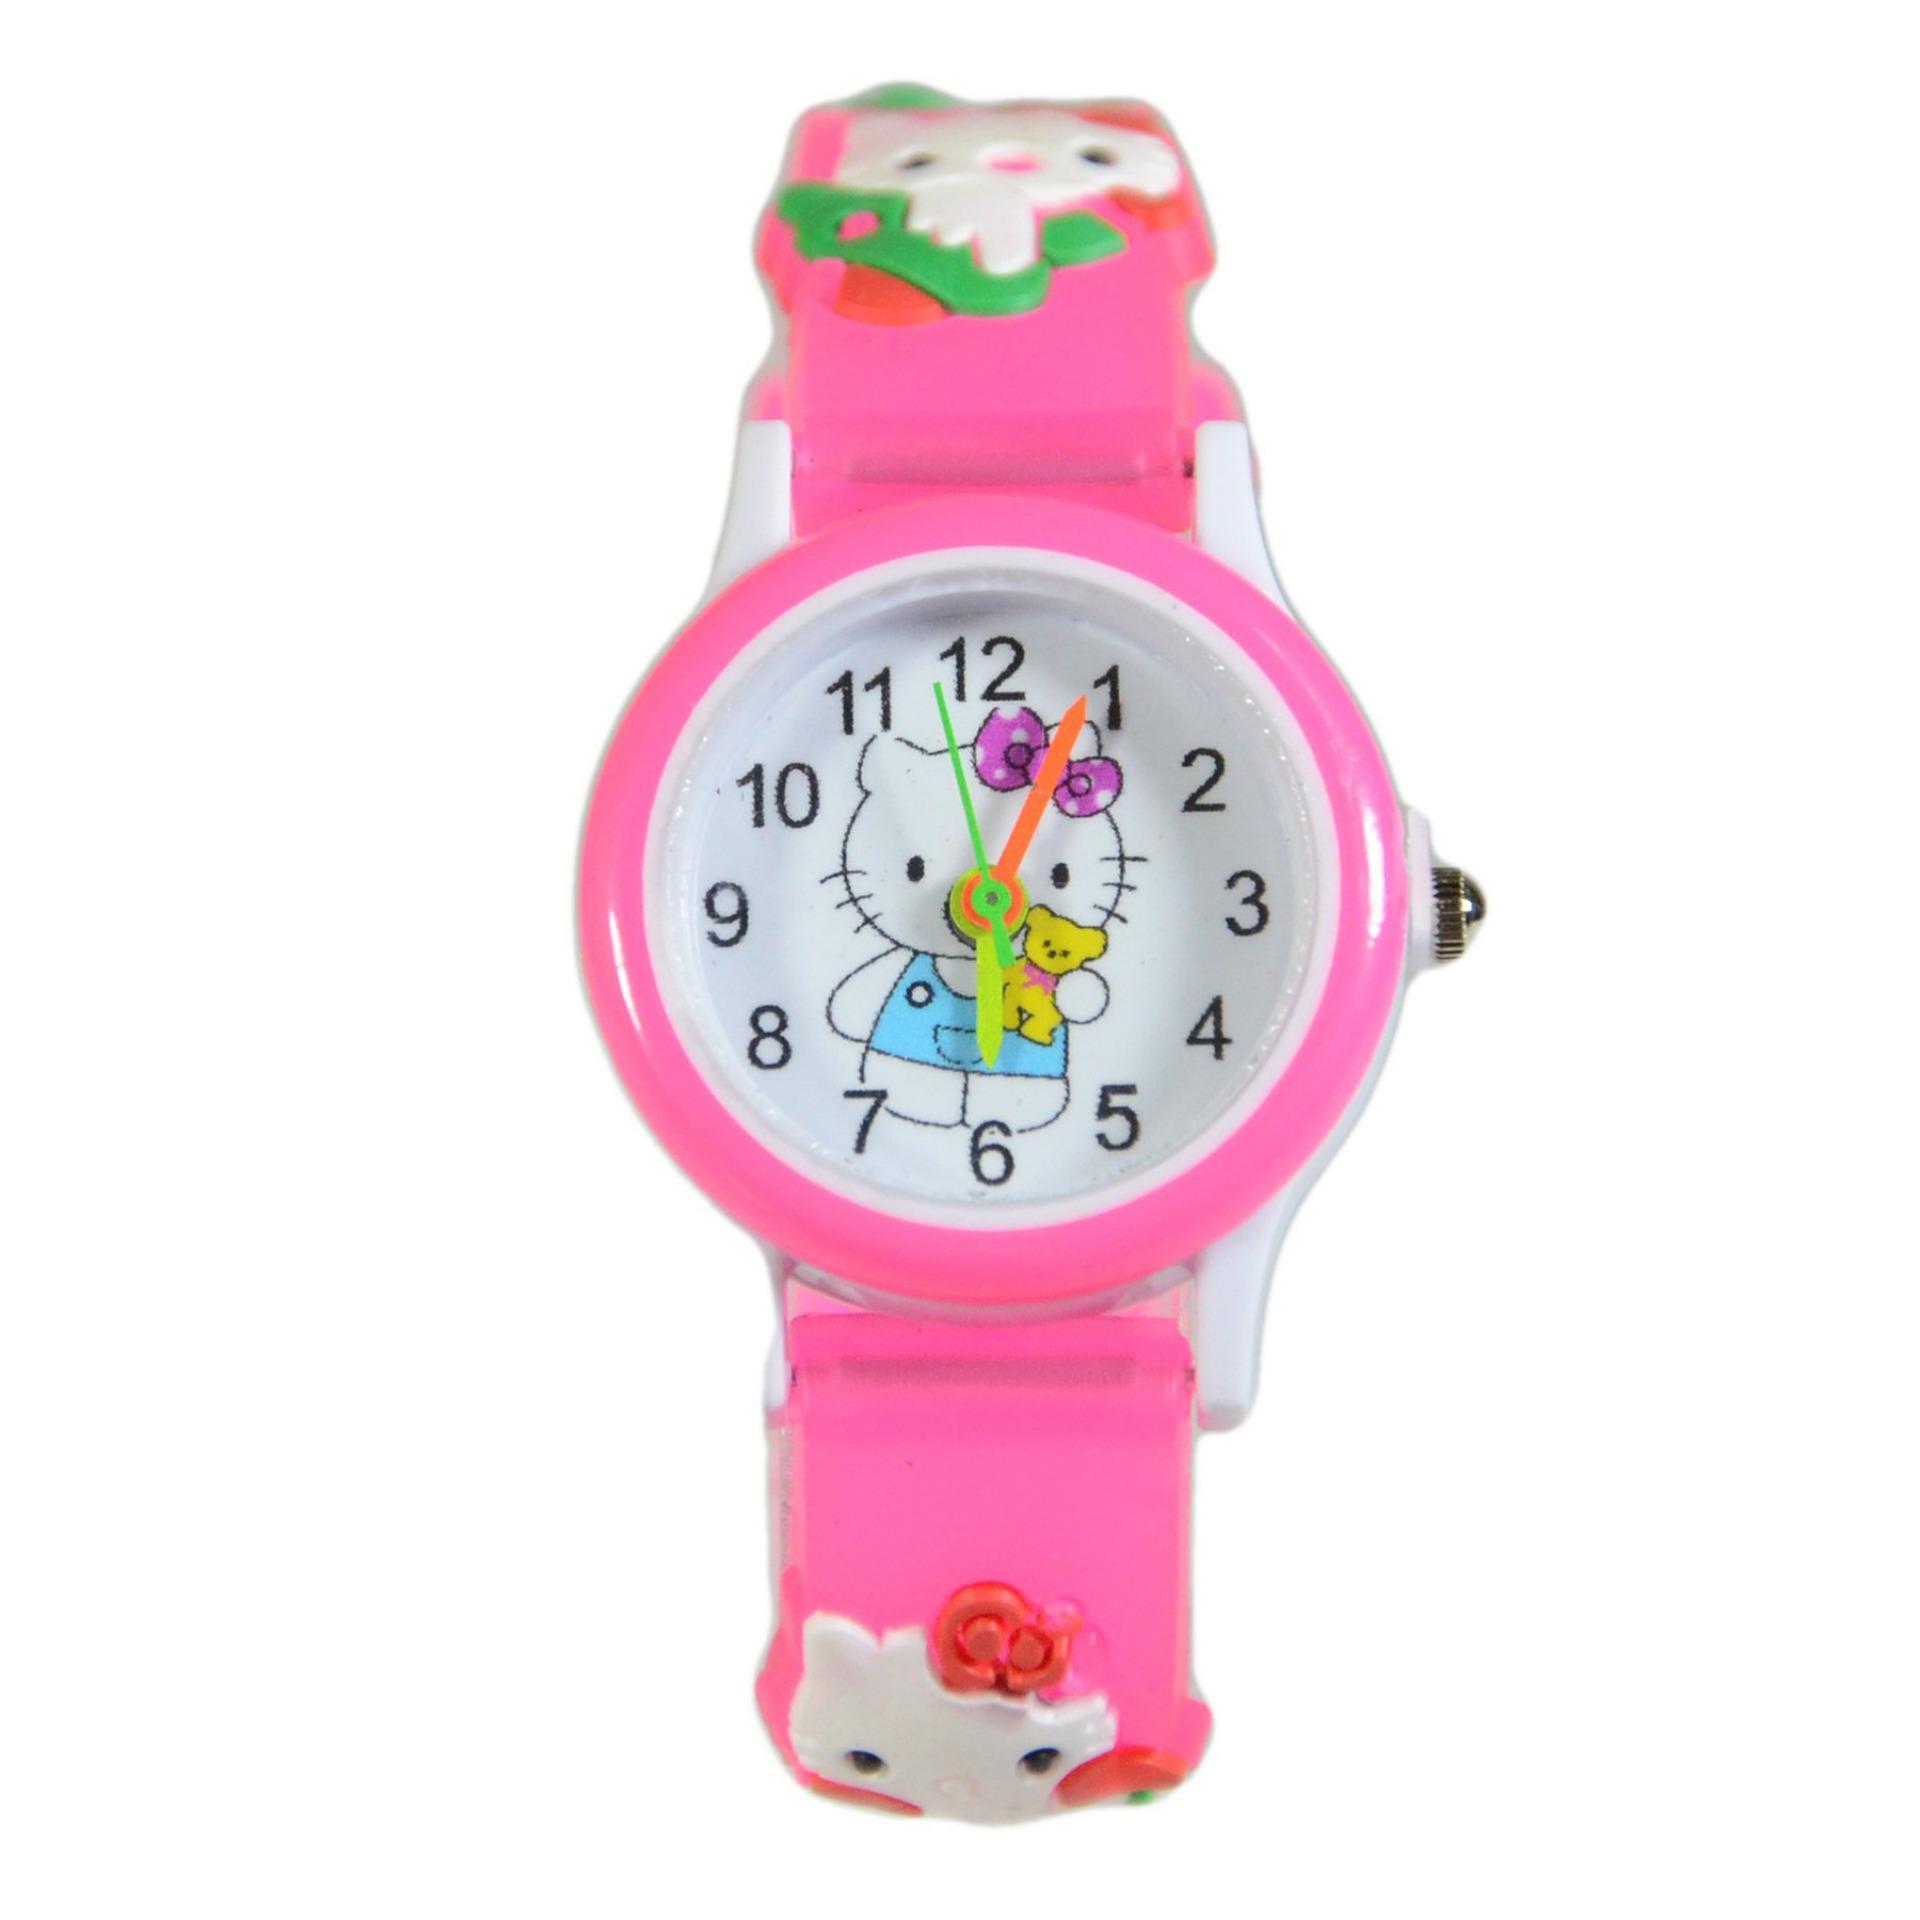 DnB COLLECTION Jam Tangan Anak Hello Kitty - Dark Pink